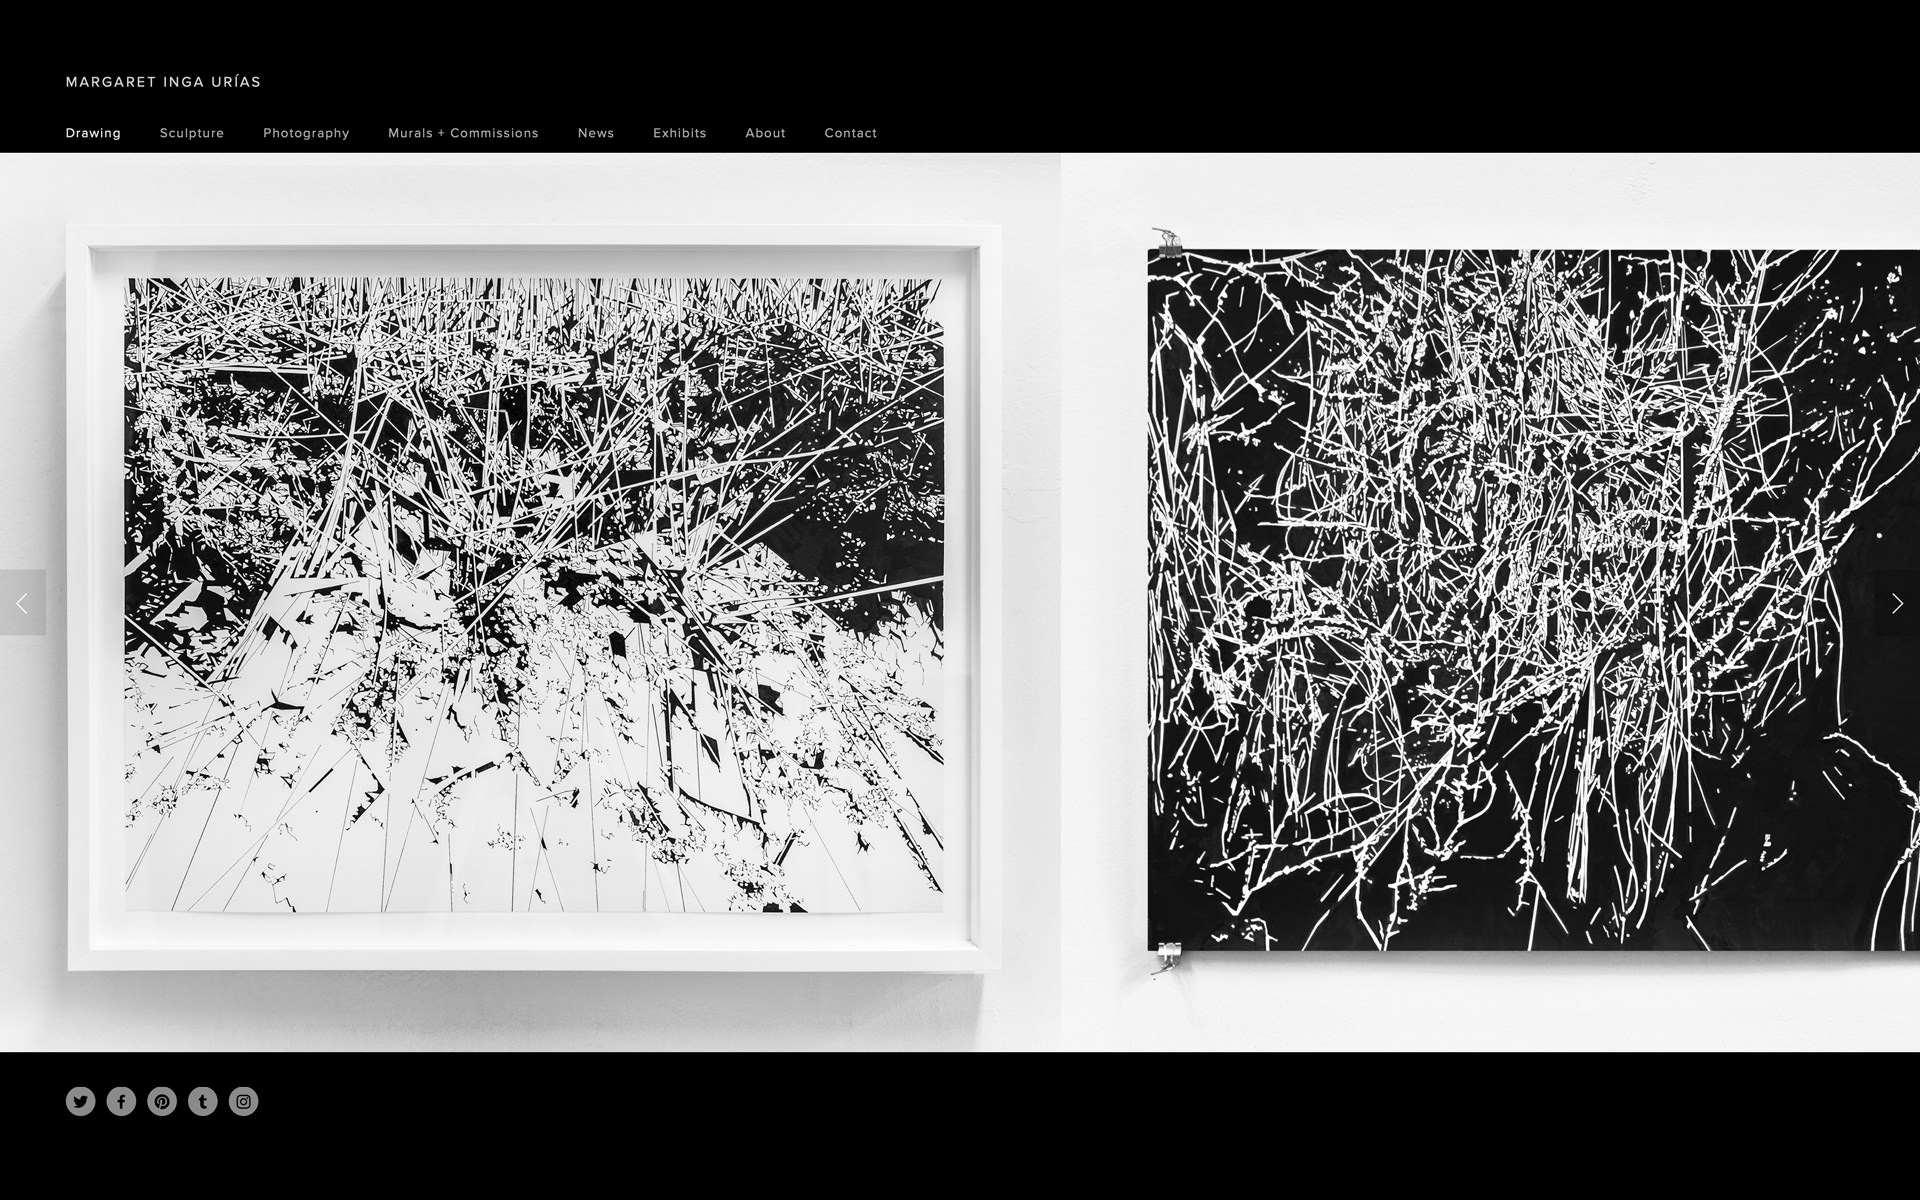 Margaret Inga • Ishimoto